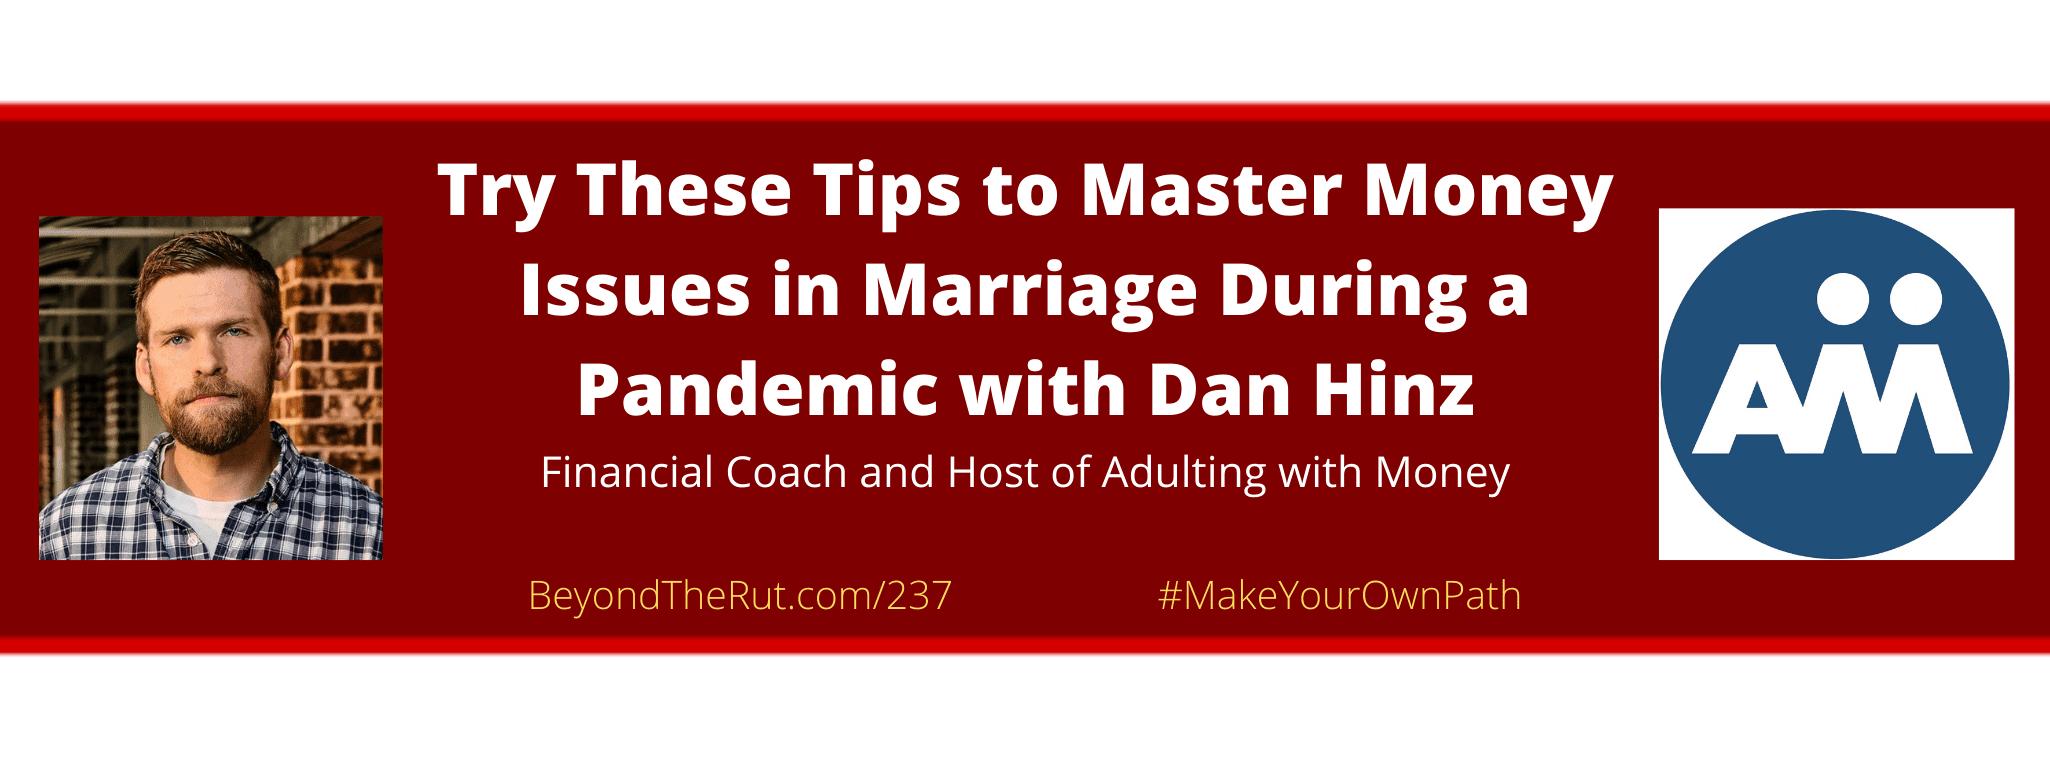 money issues with marriage dan hinz